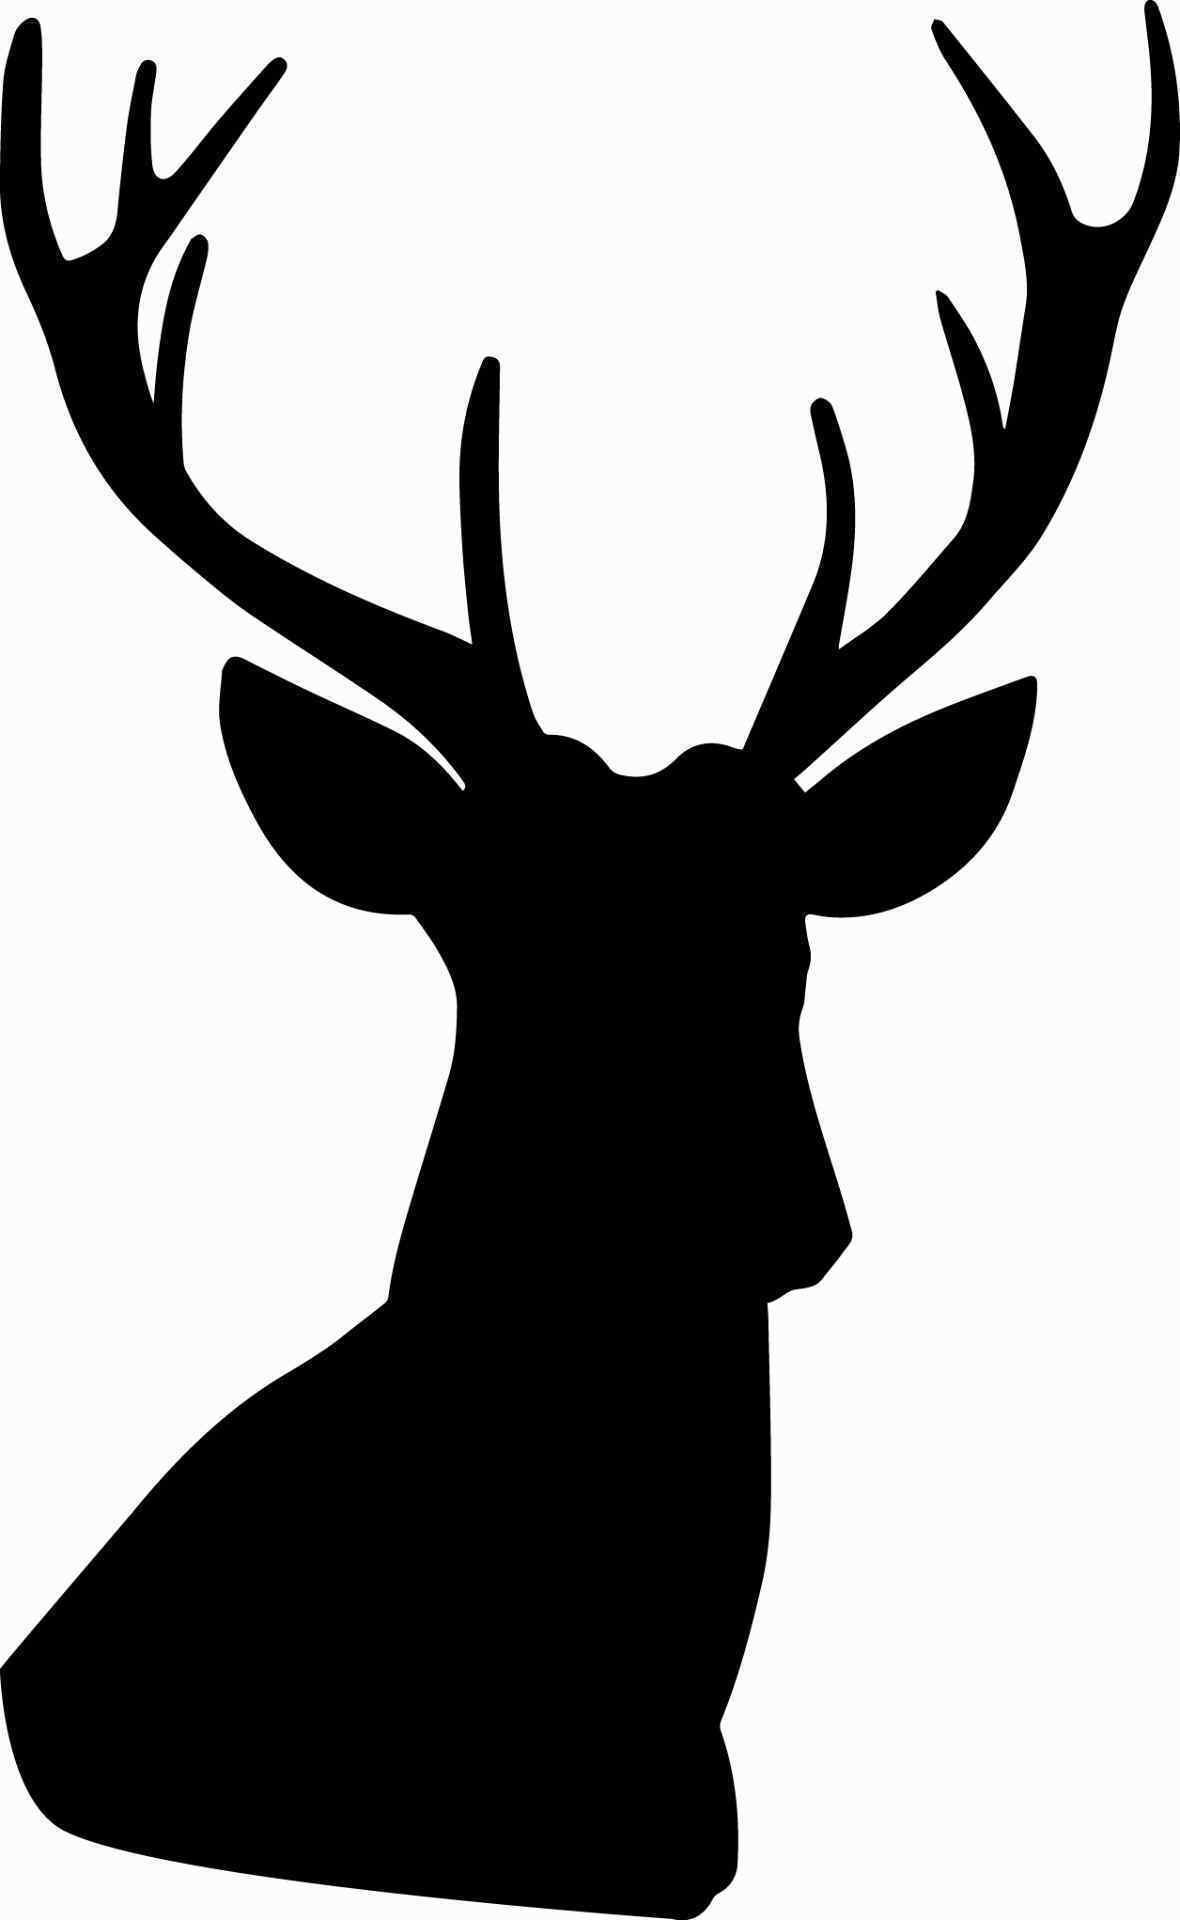 1180x1920 Reindeer Silhouette Template Inspirational Hunting Deer Head Clip